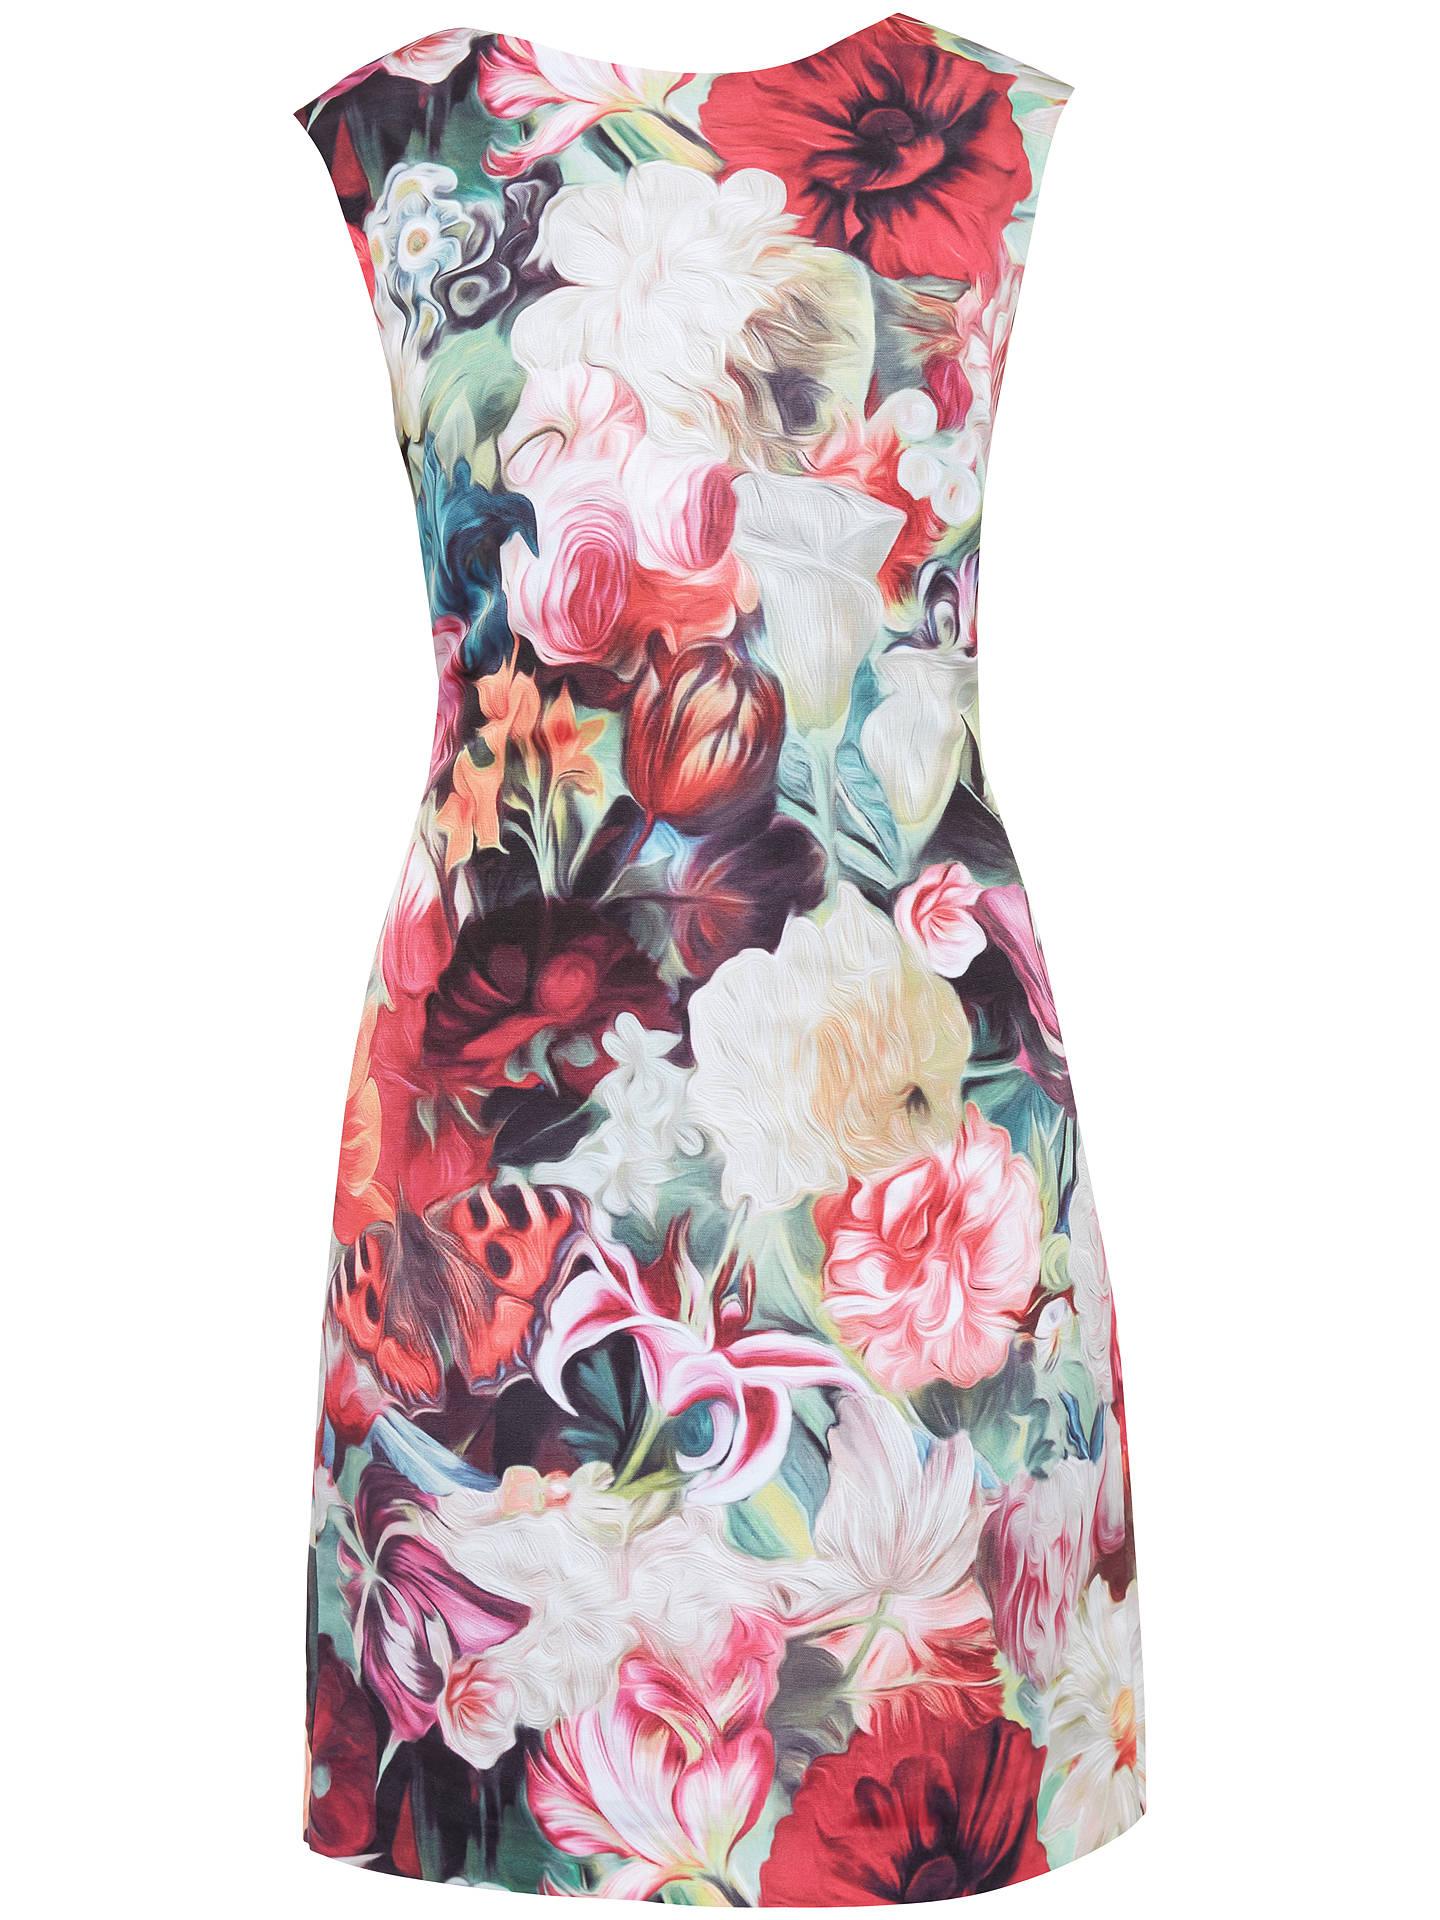 9e32744d2a720 Buy Ted Baker Quais Floral Swirl Tunic Dress